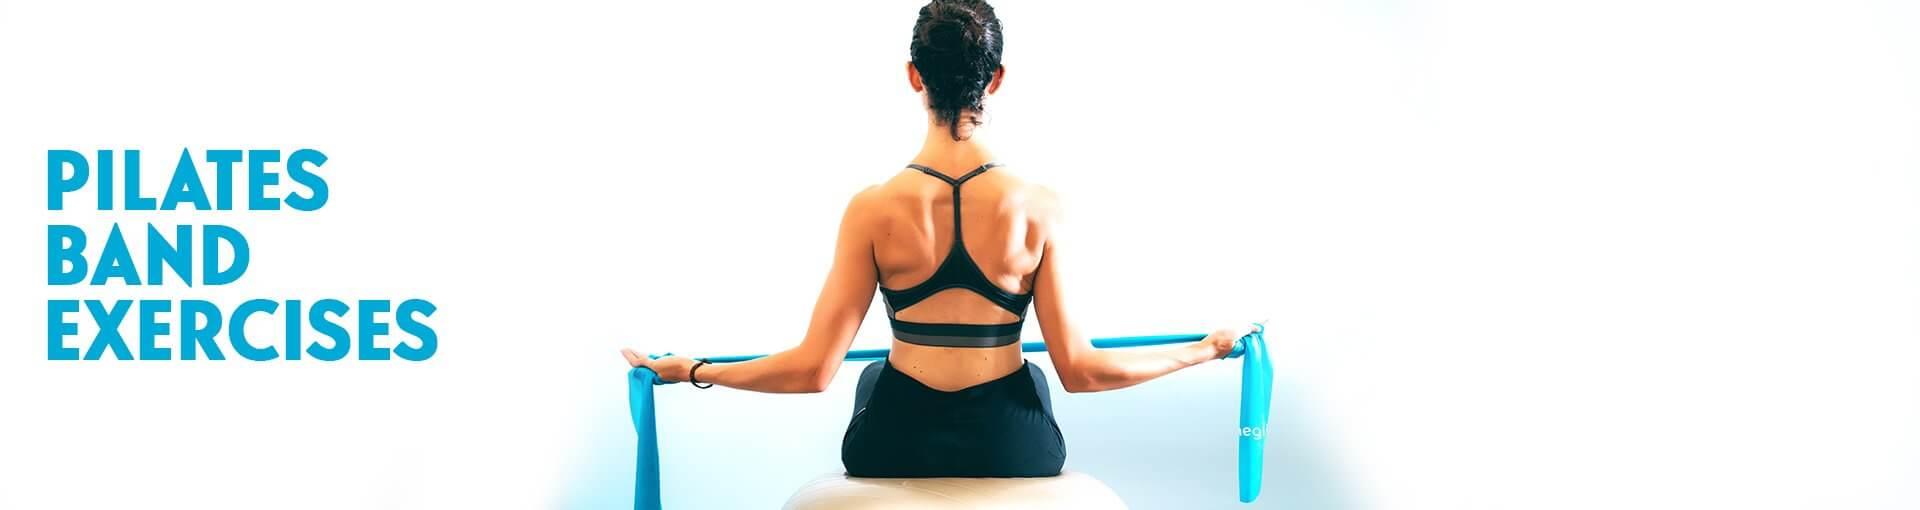 10 Pilates Band Exercises - Improve your Pilates Routine